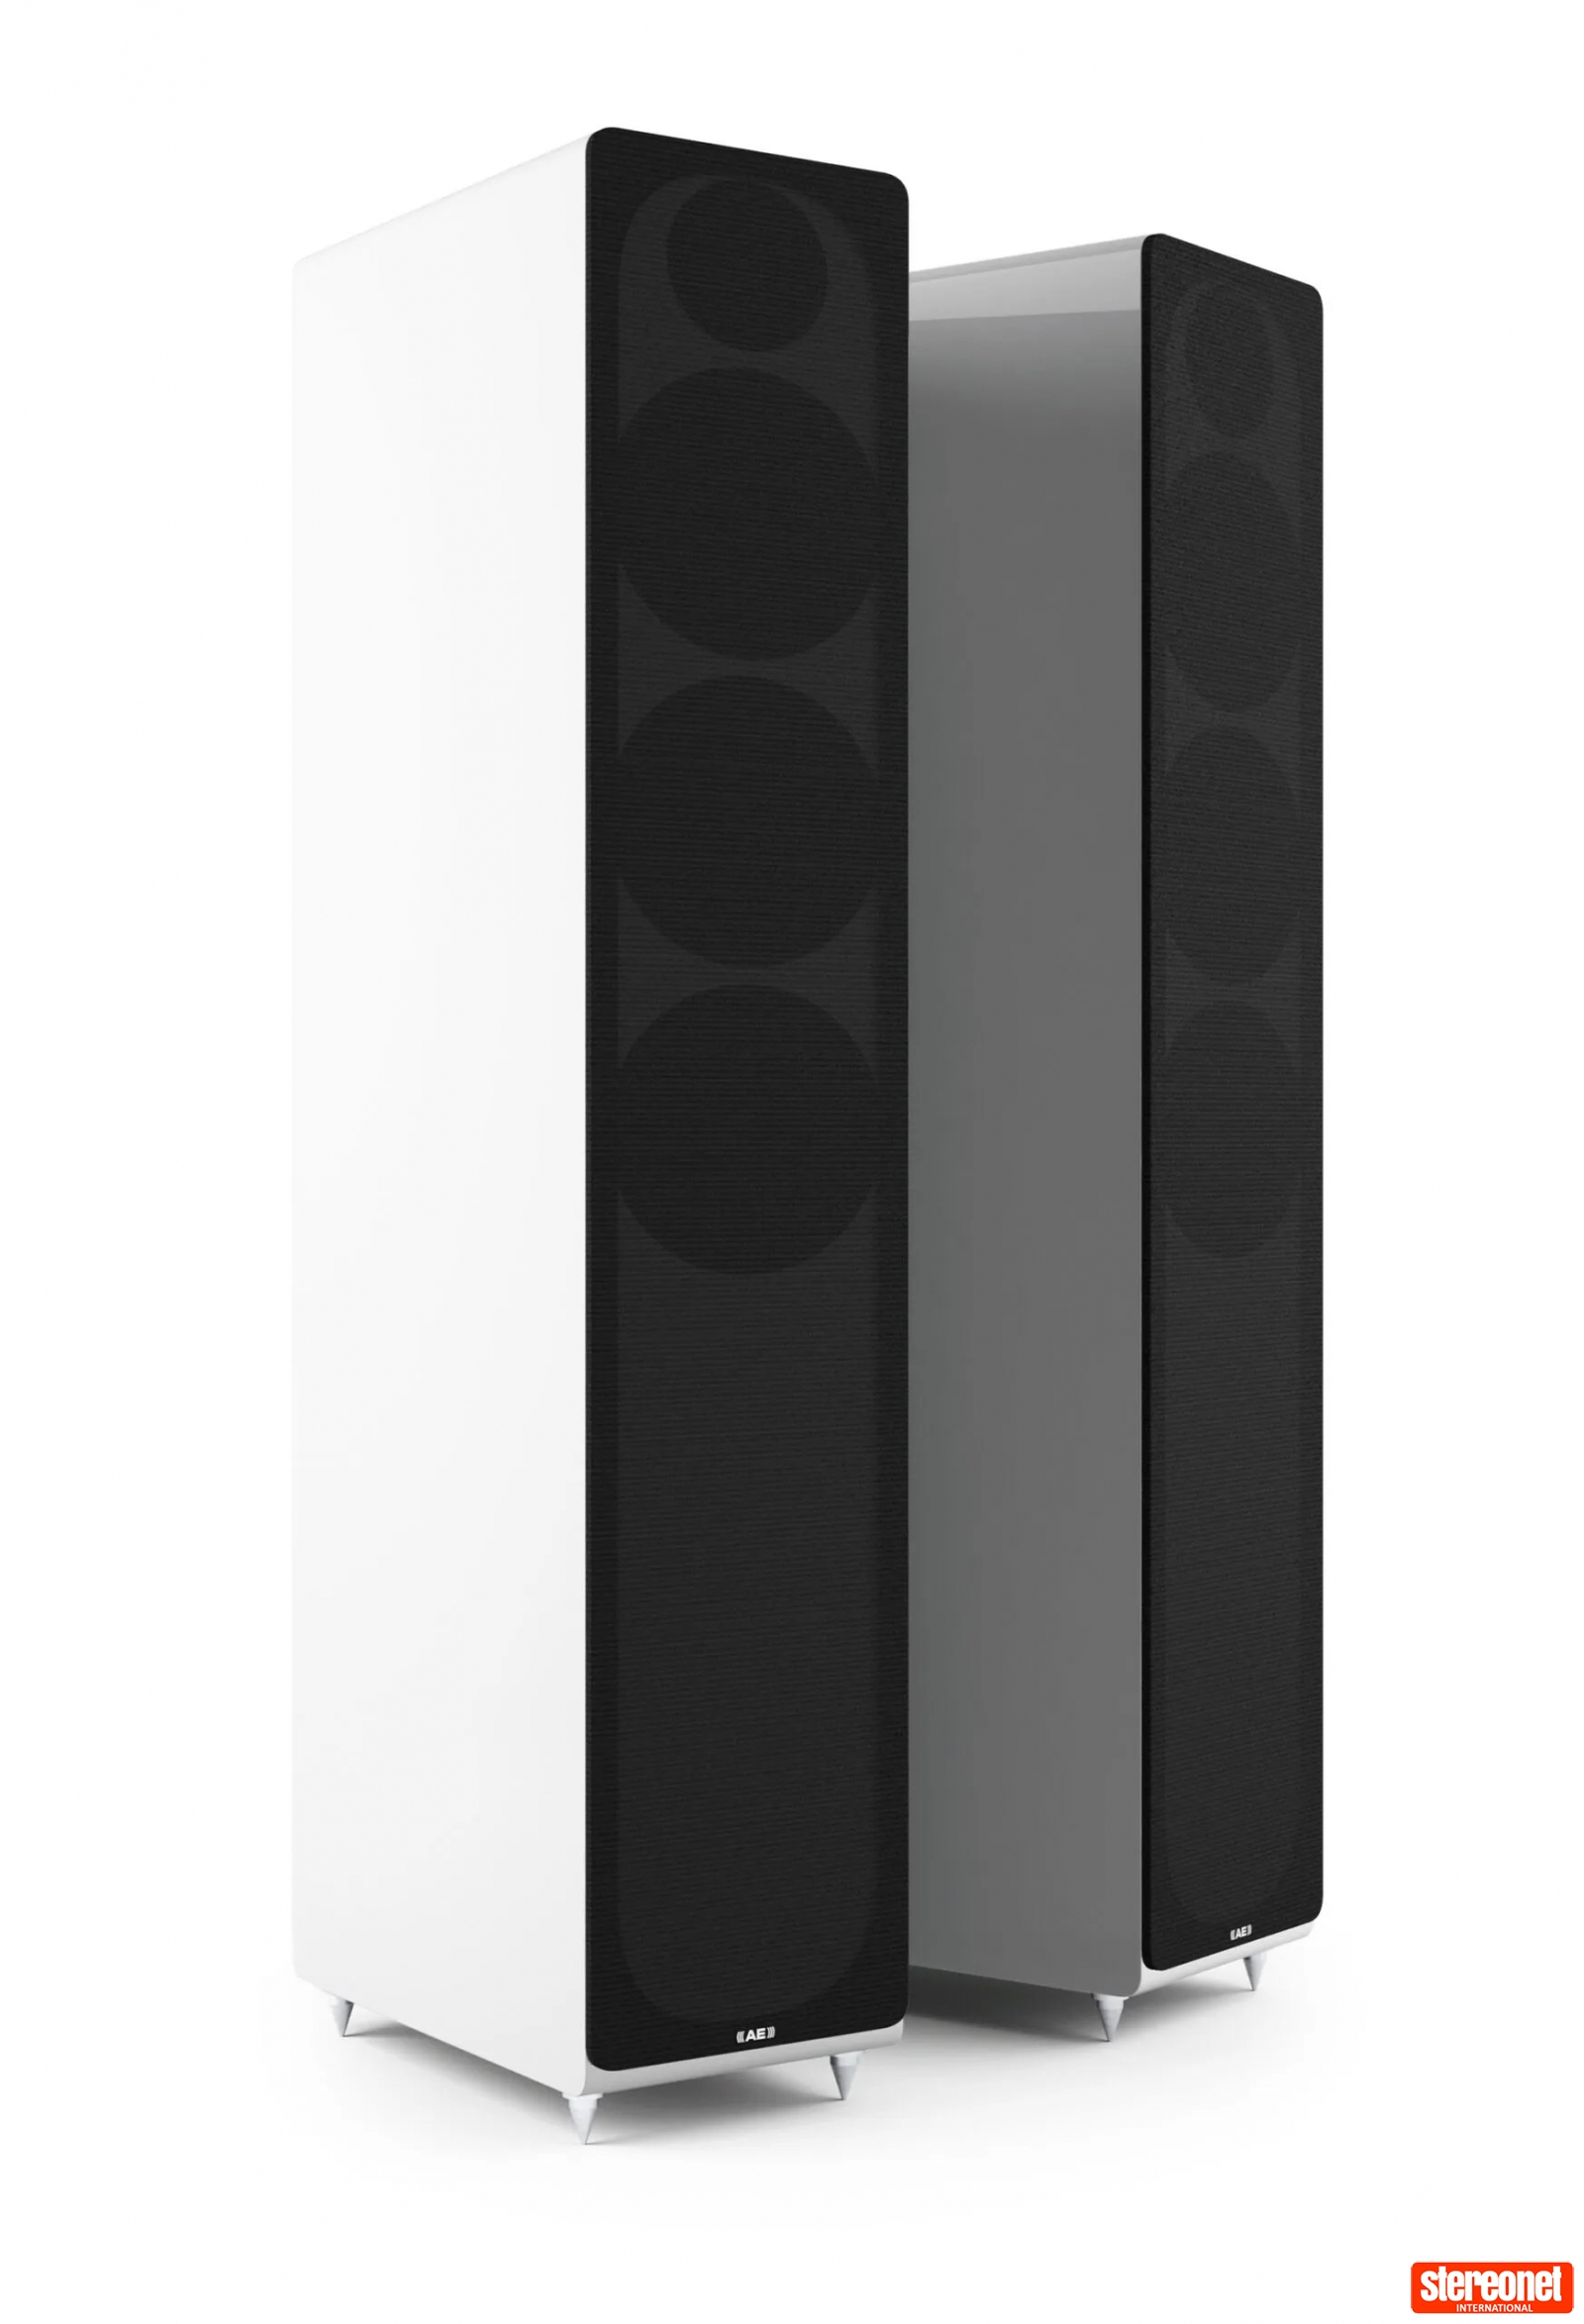 Acoustic Energy AE320